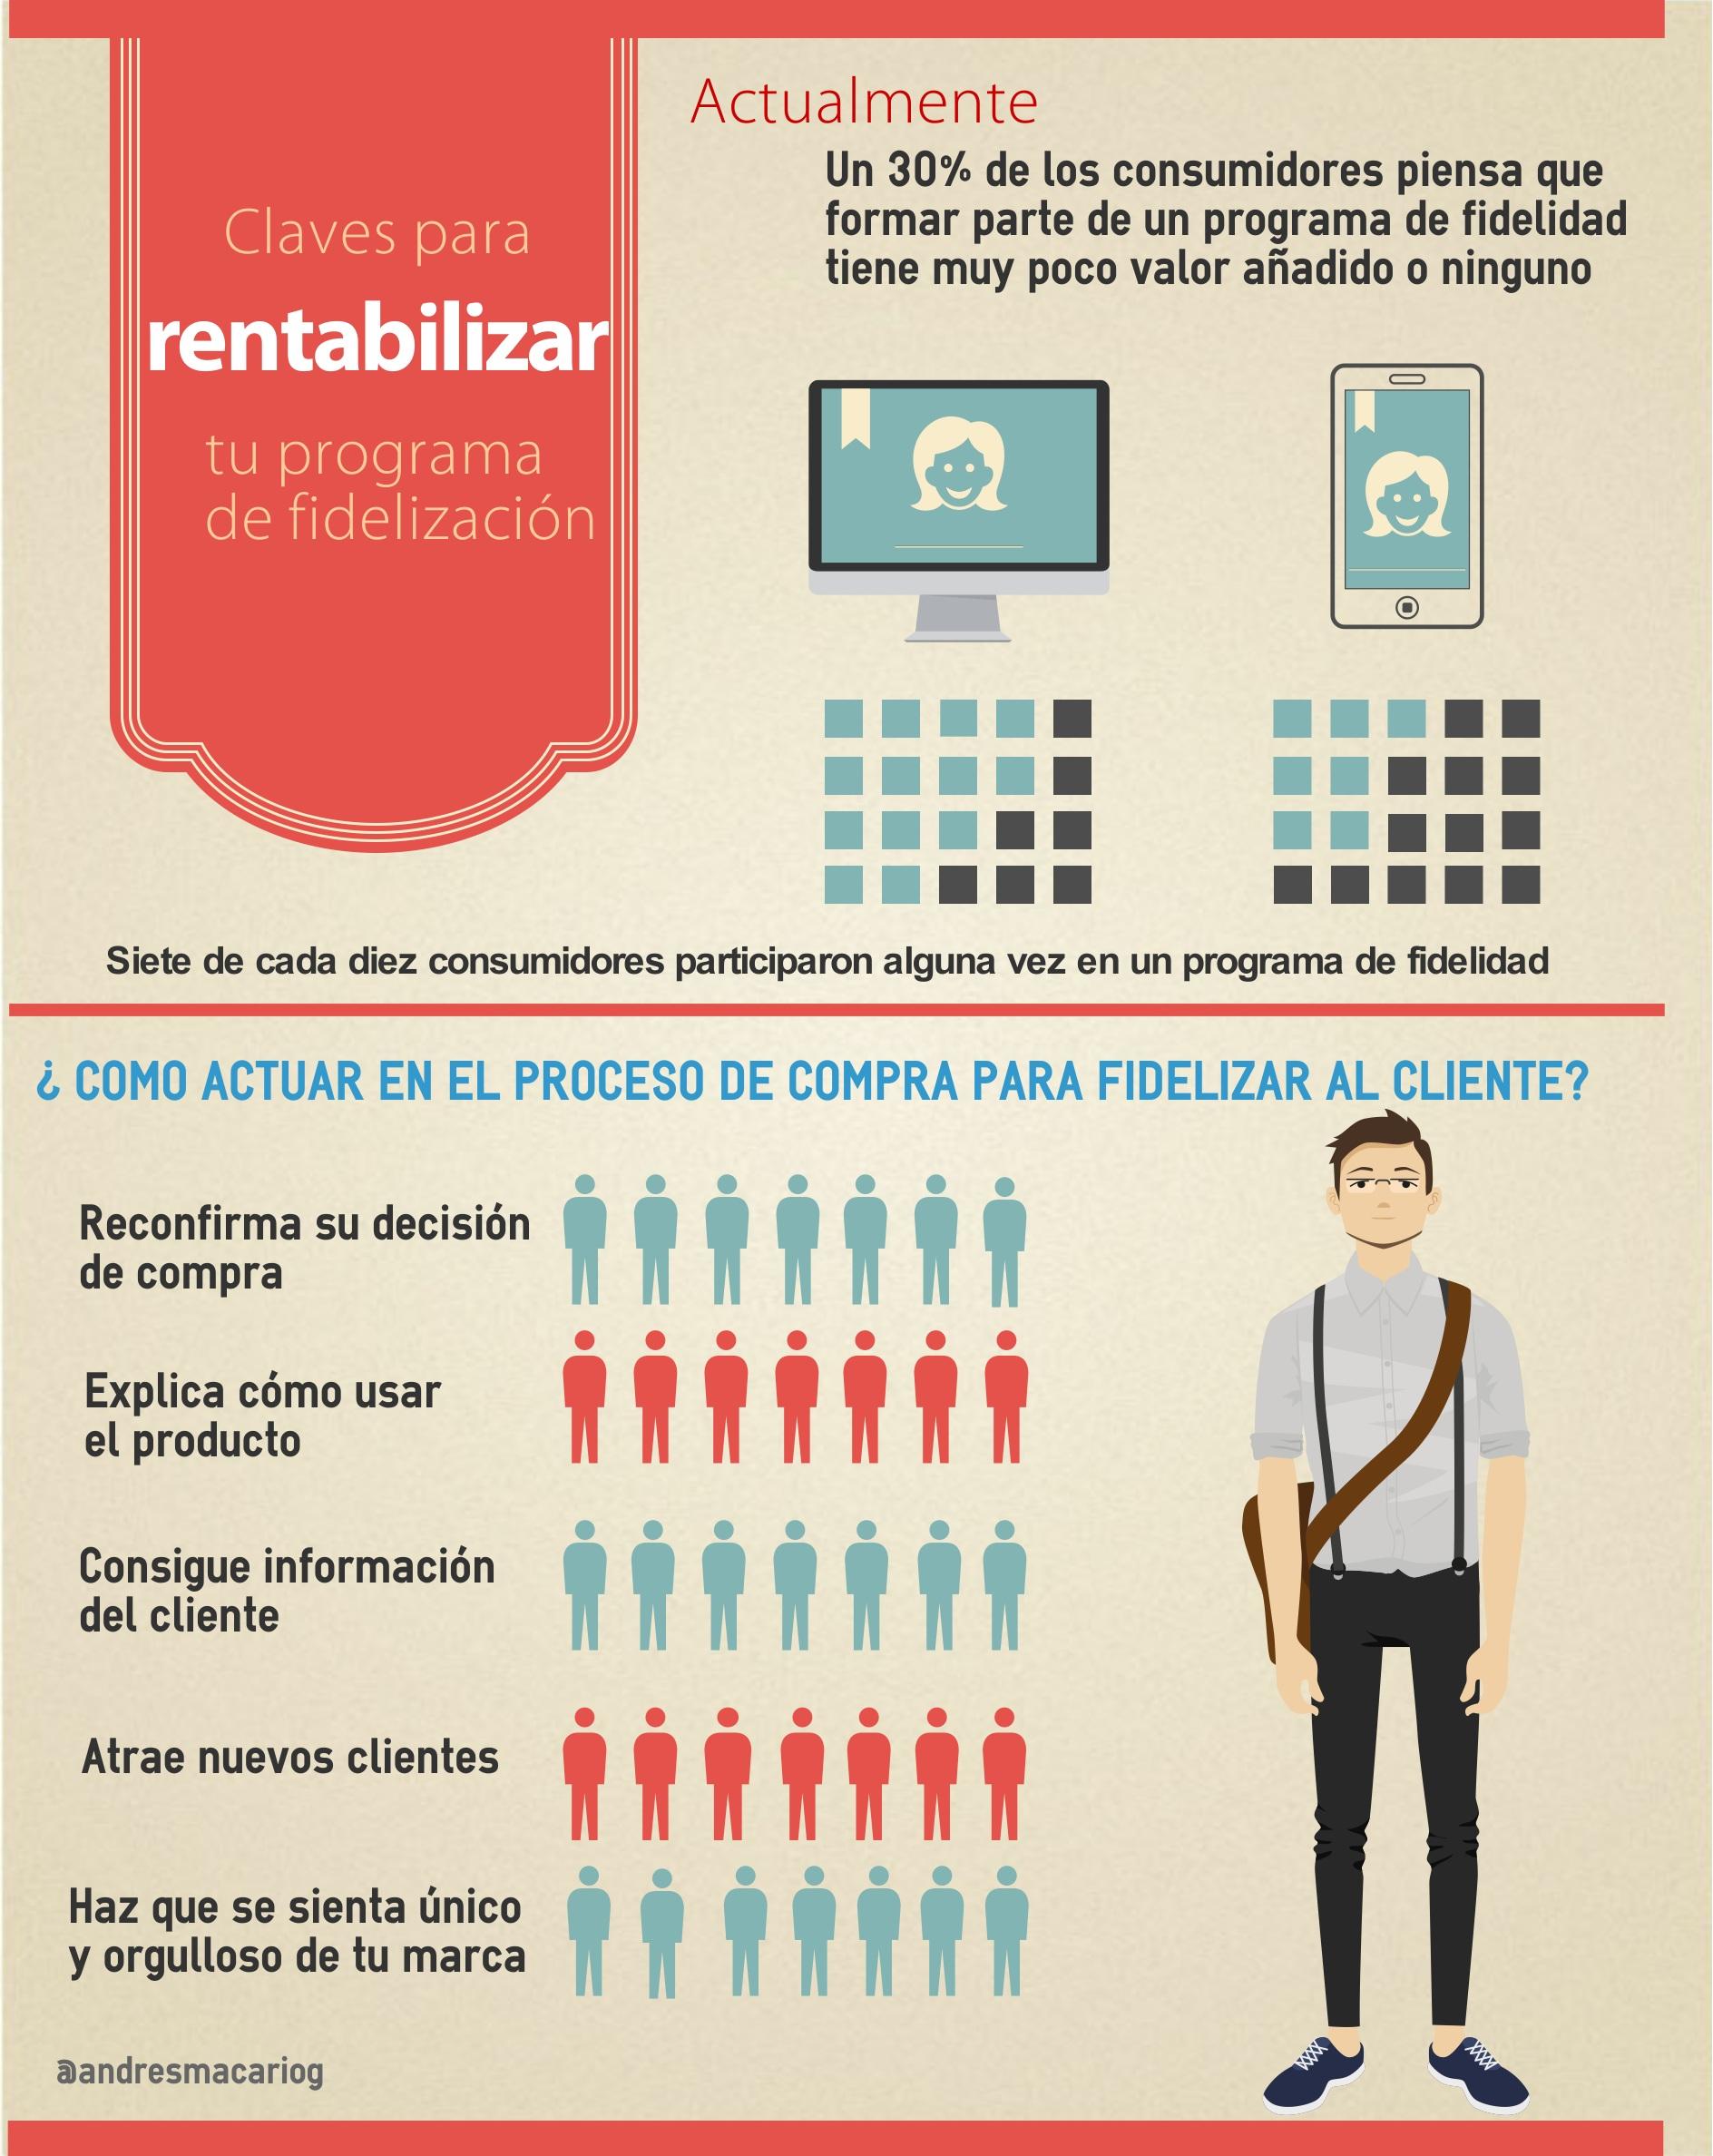 Claves-para-rentabilizar-programa-fidelizacion-Infografia-Andres-Macario